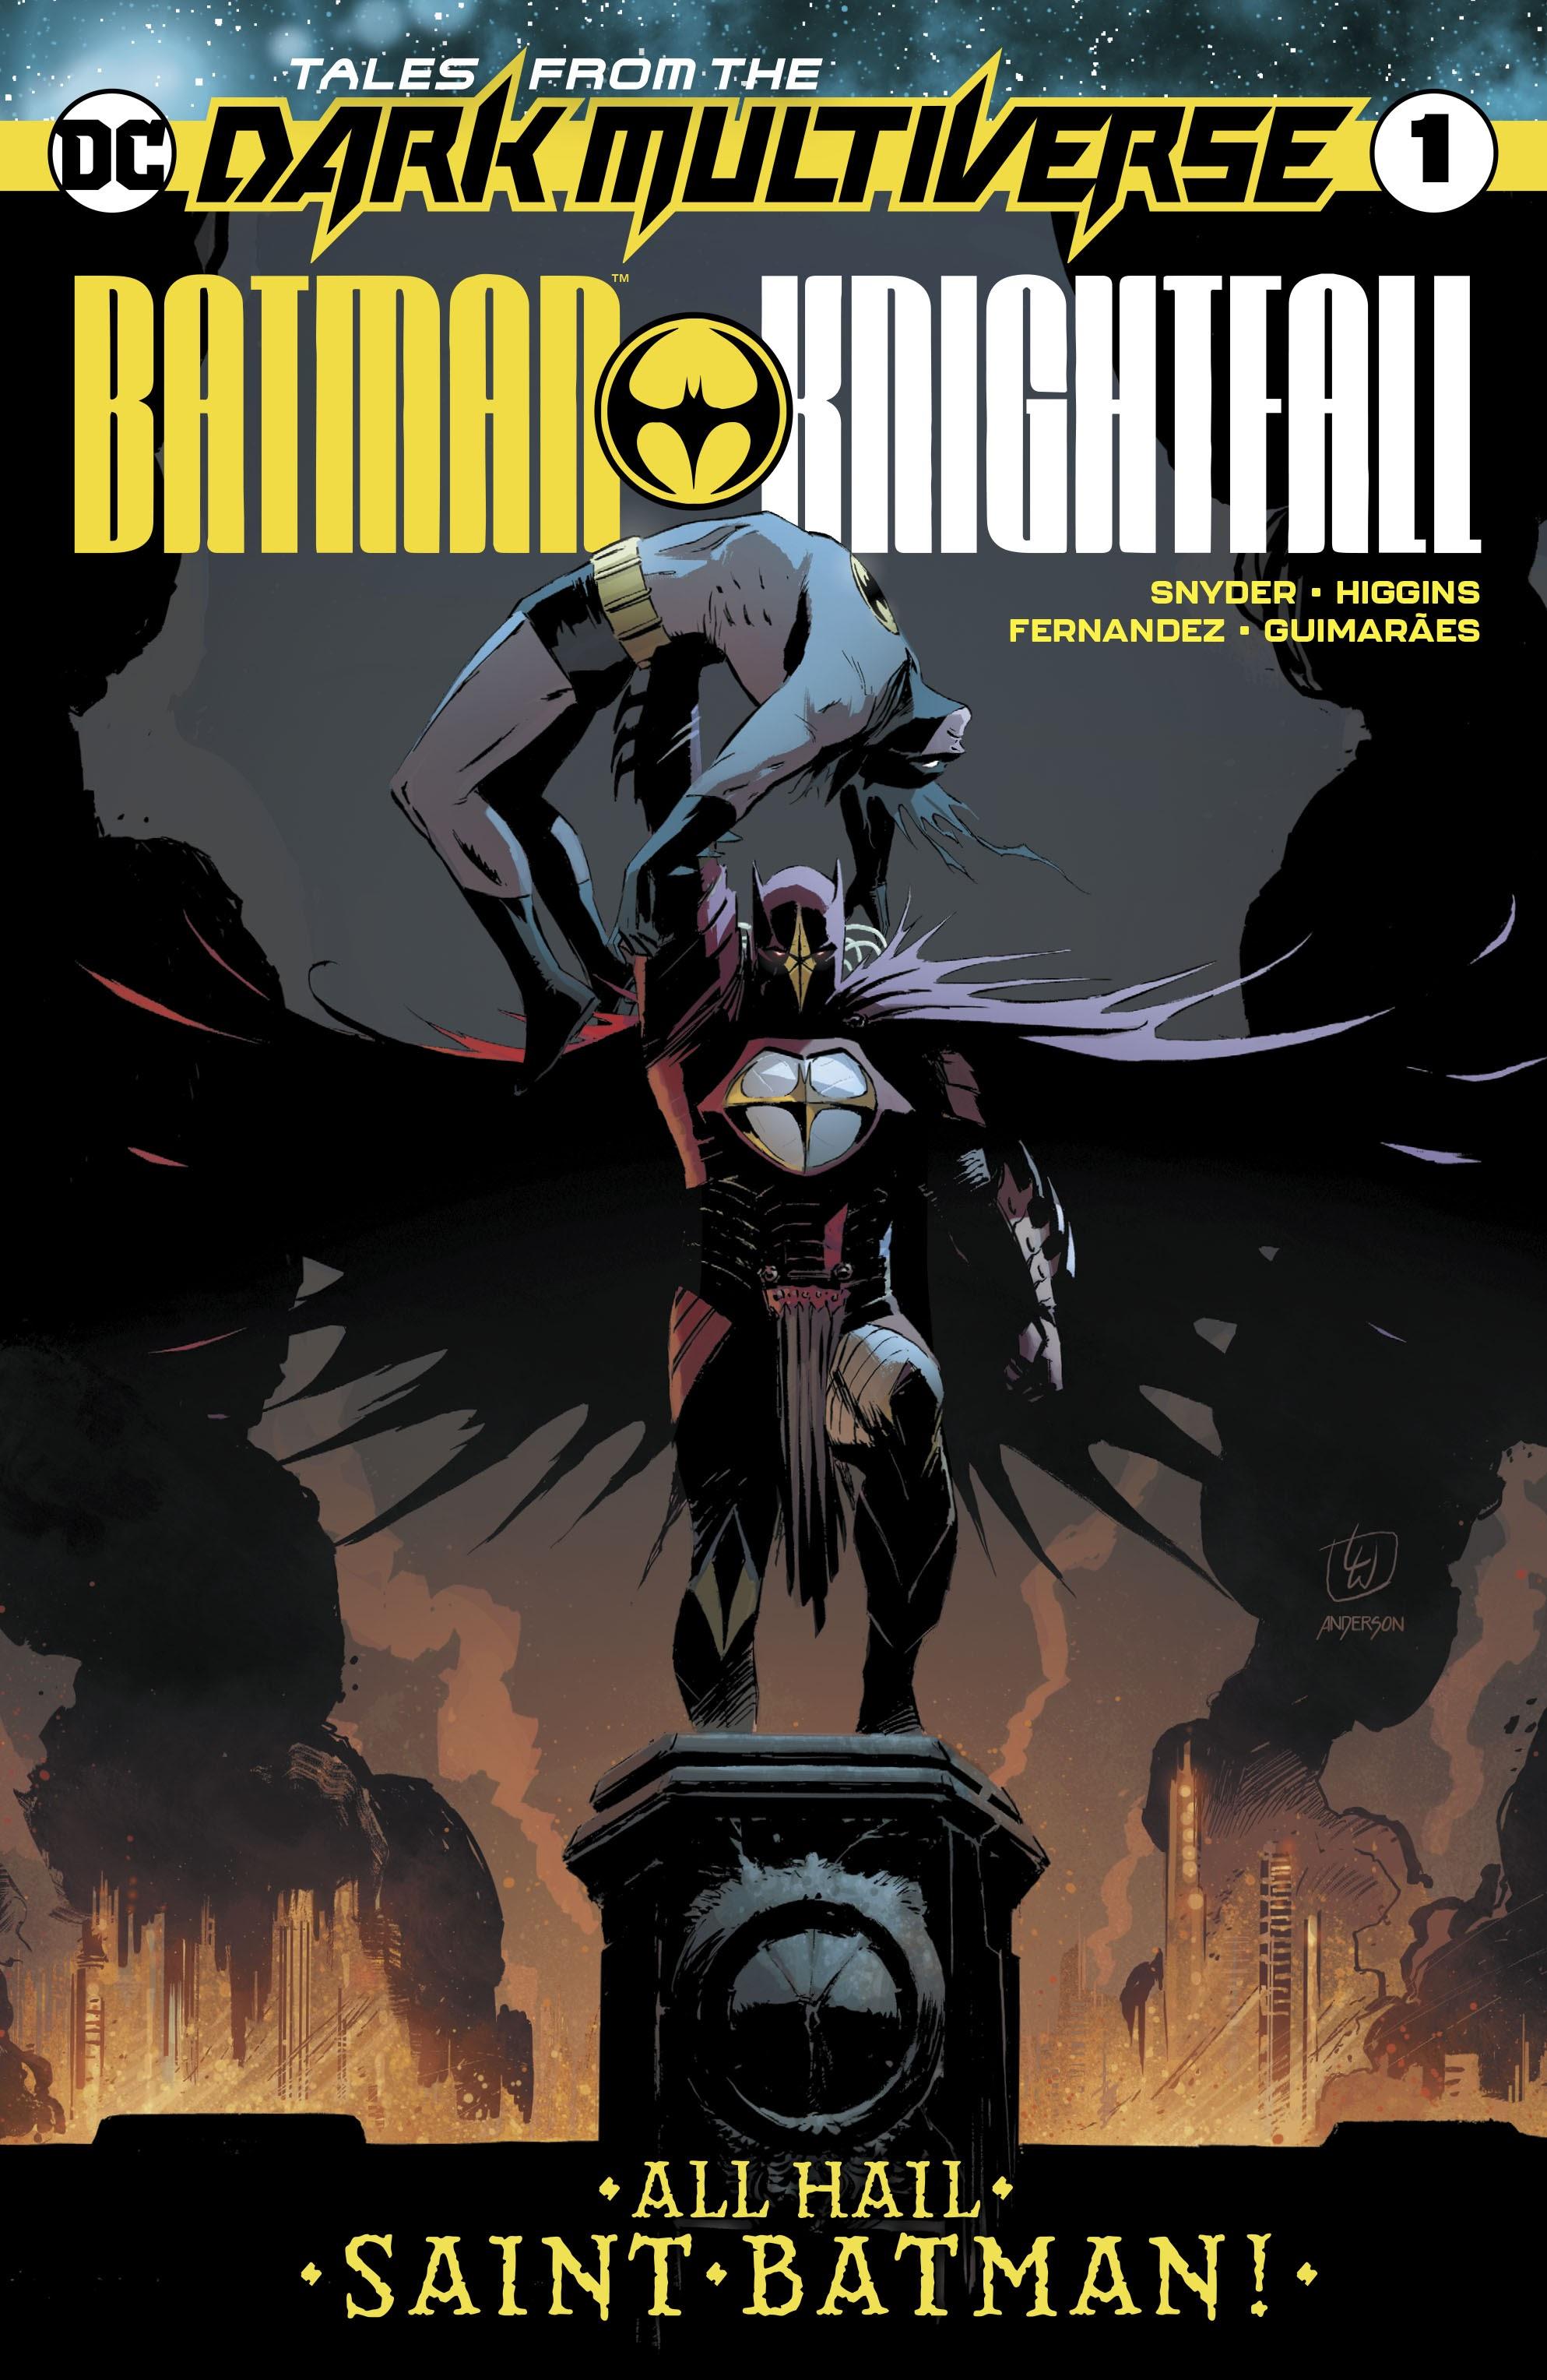 Tales from the Dark Multiverse: Batman Knightfall Full Page 1